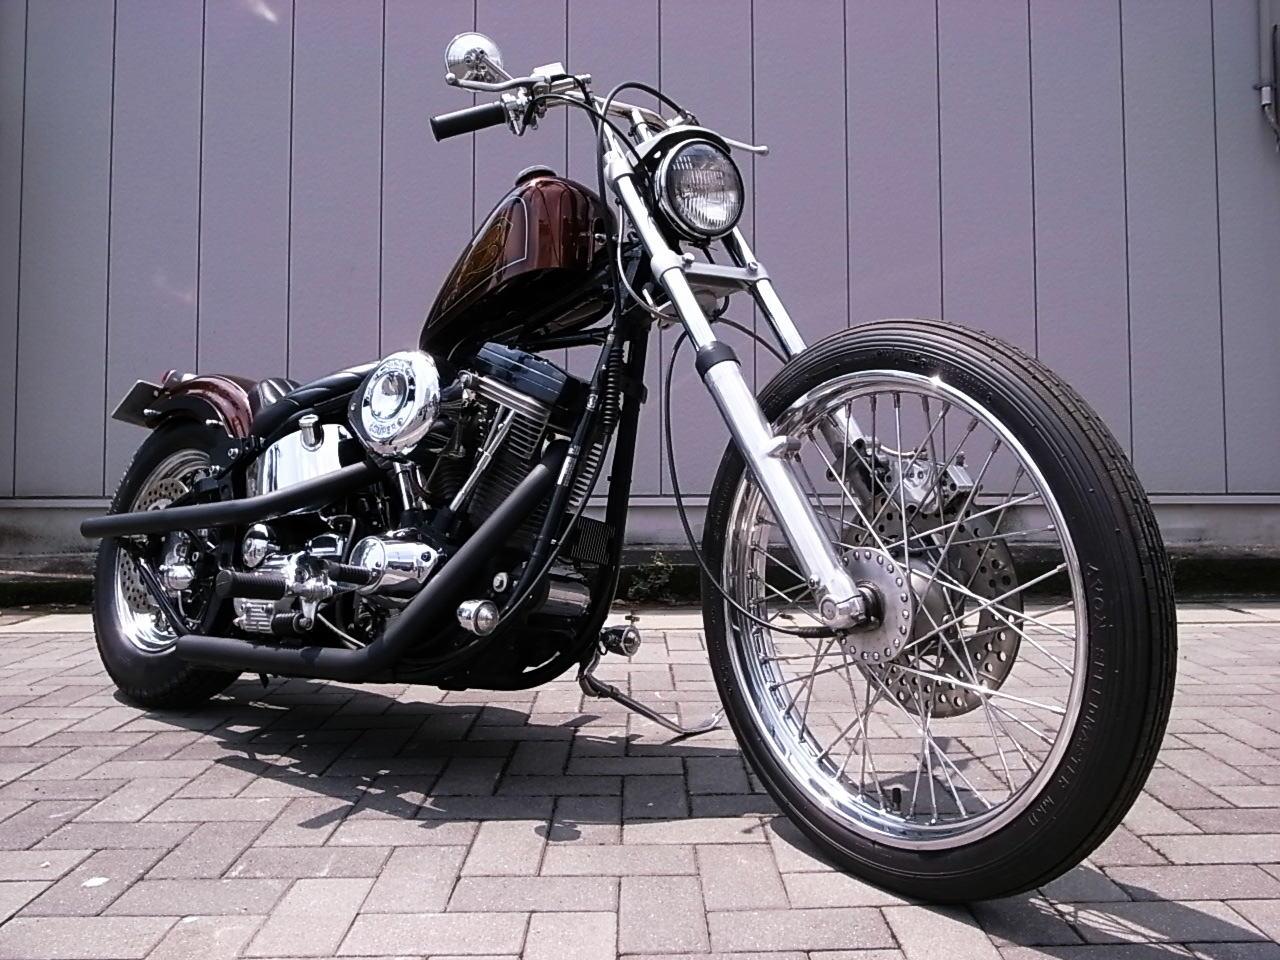 EVO Softail Chopper_b0160319_12423465.jpg